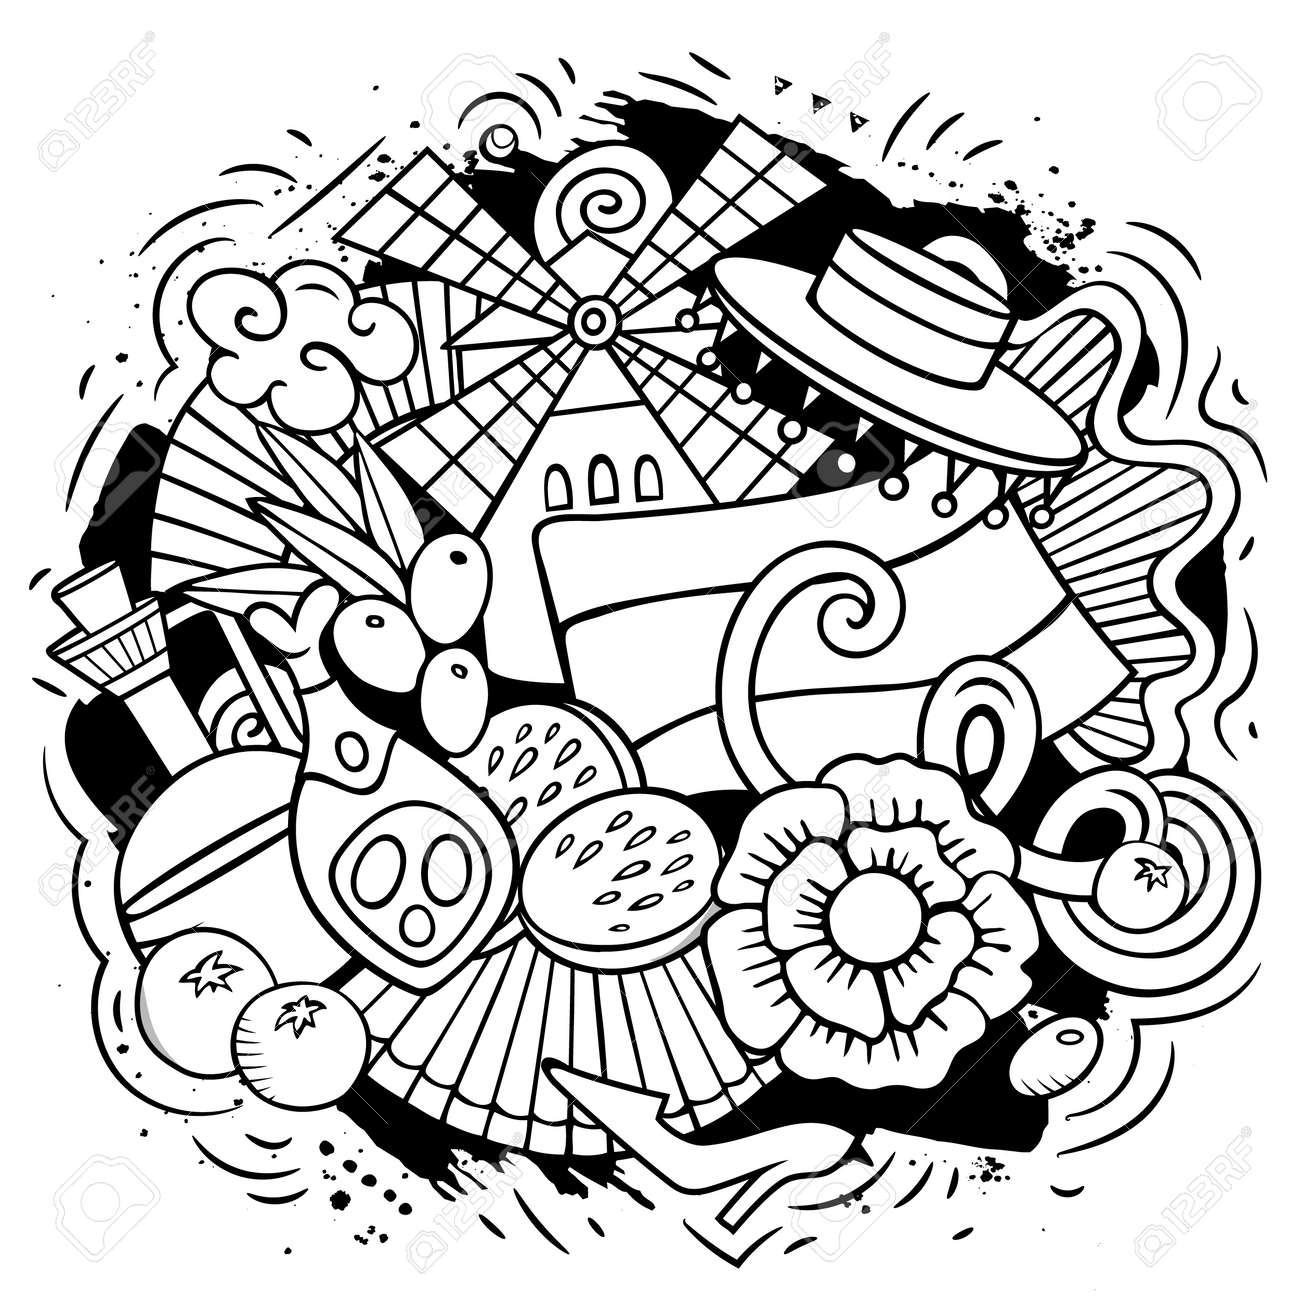 Spain hand drawn cartoon doodle illustration - 170244475